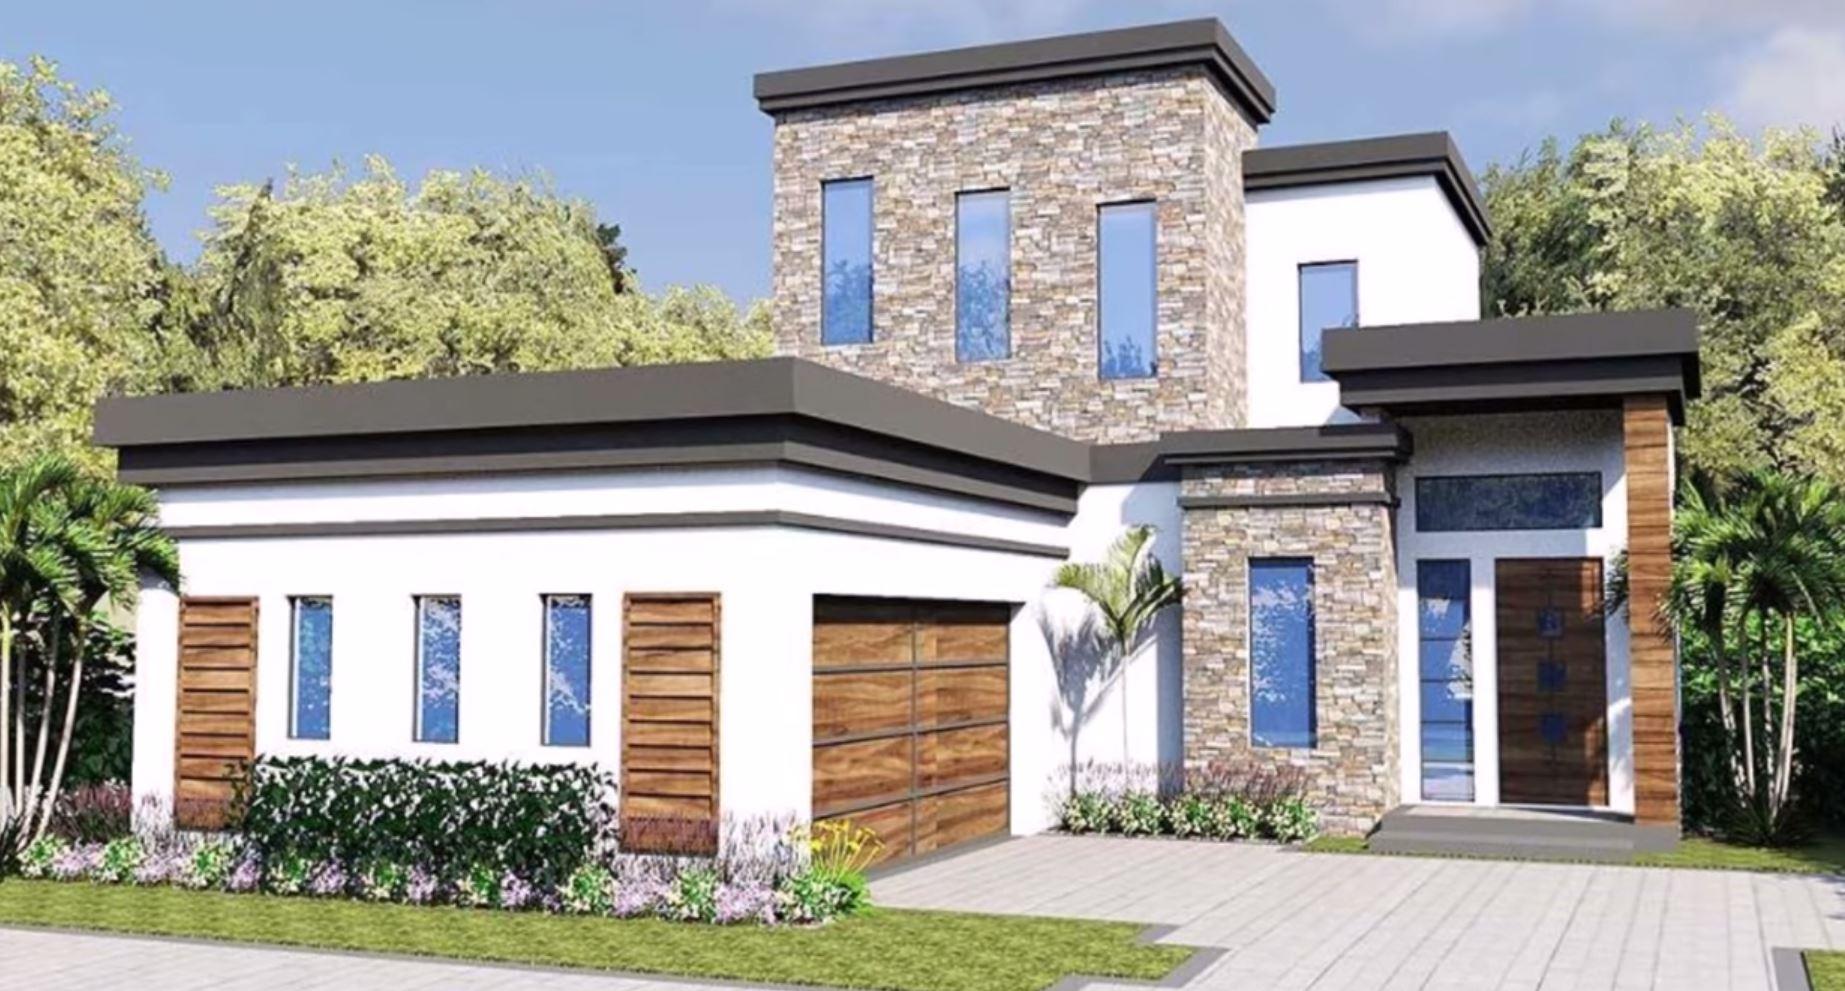 Plano de casa de dos plantas for Planos y fachadas de casas pequenas de dos plantas